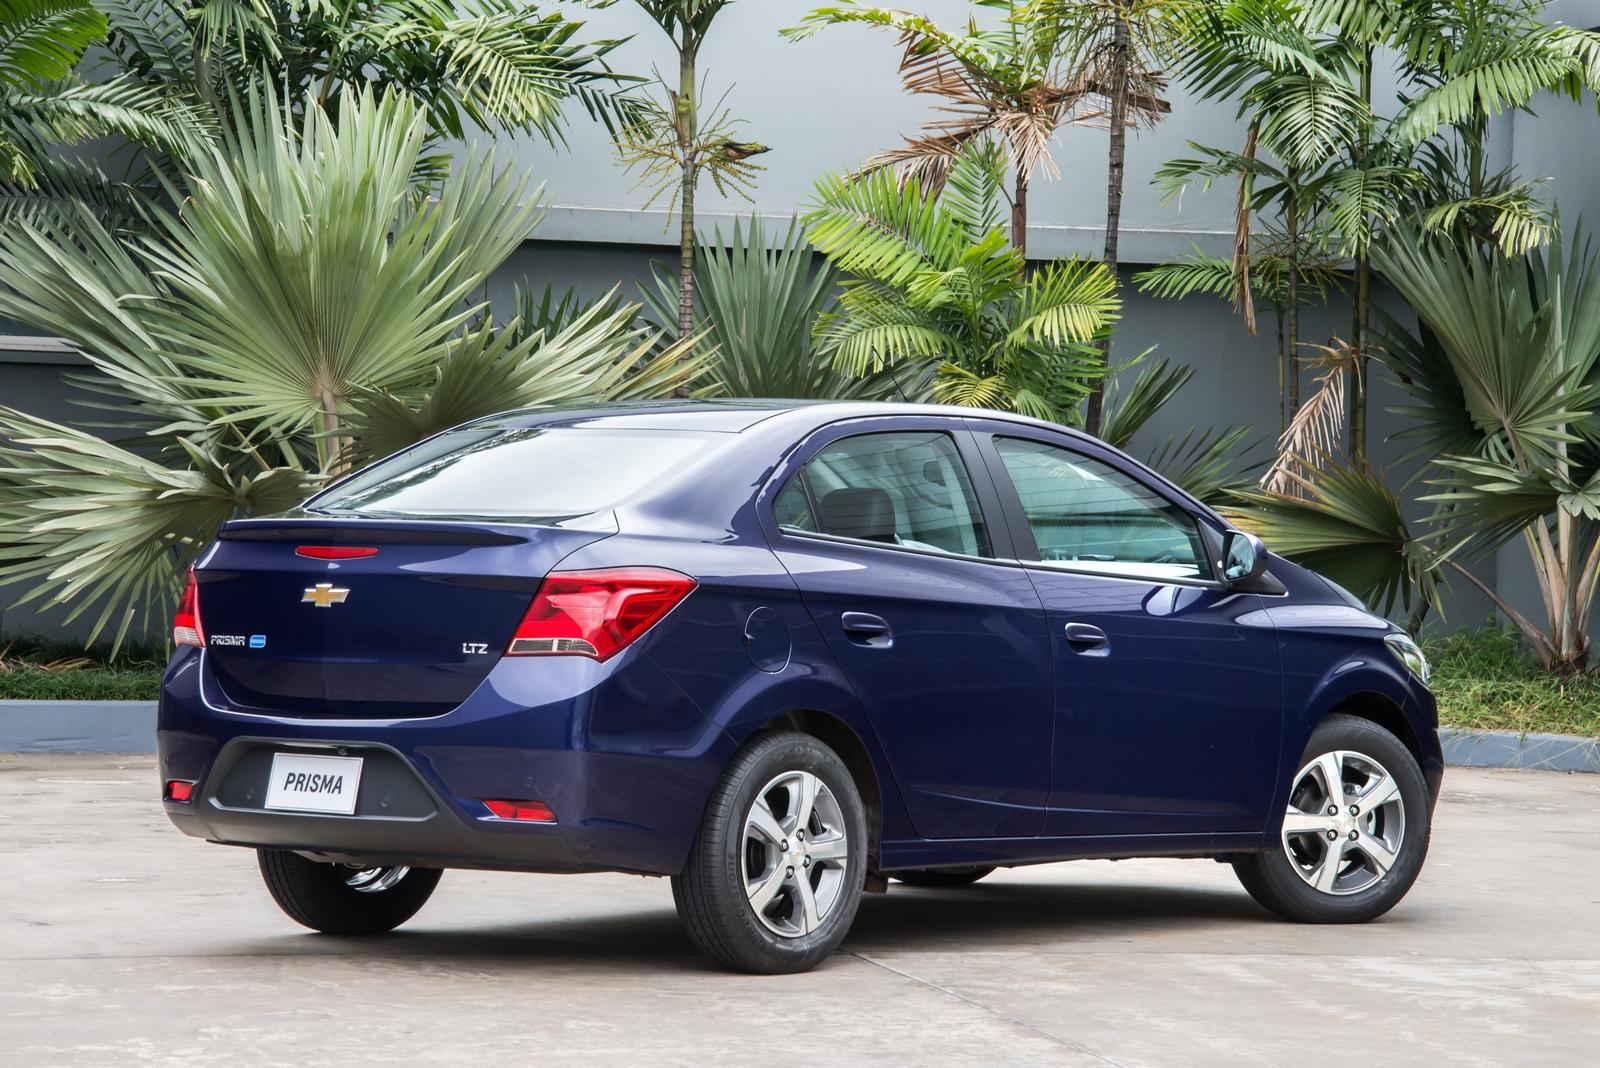 Переехавший на новую платформу «бюджетник» Chevrolet Prisma опять попался фотошпионам